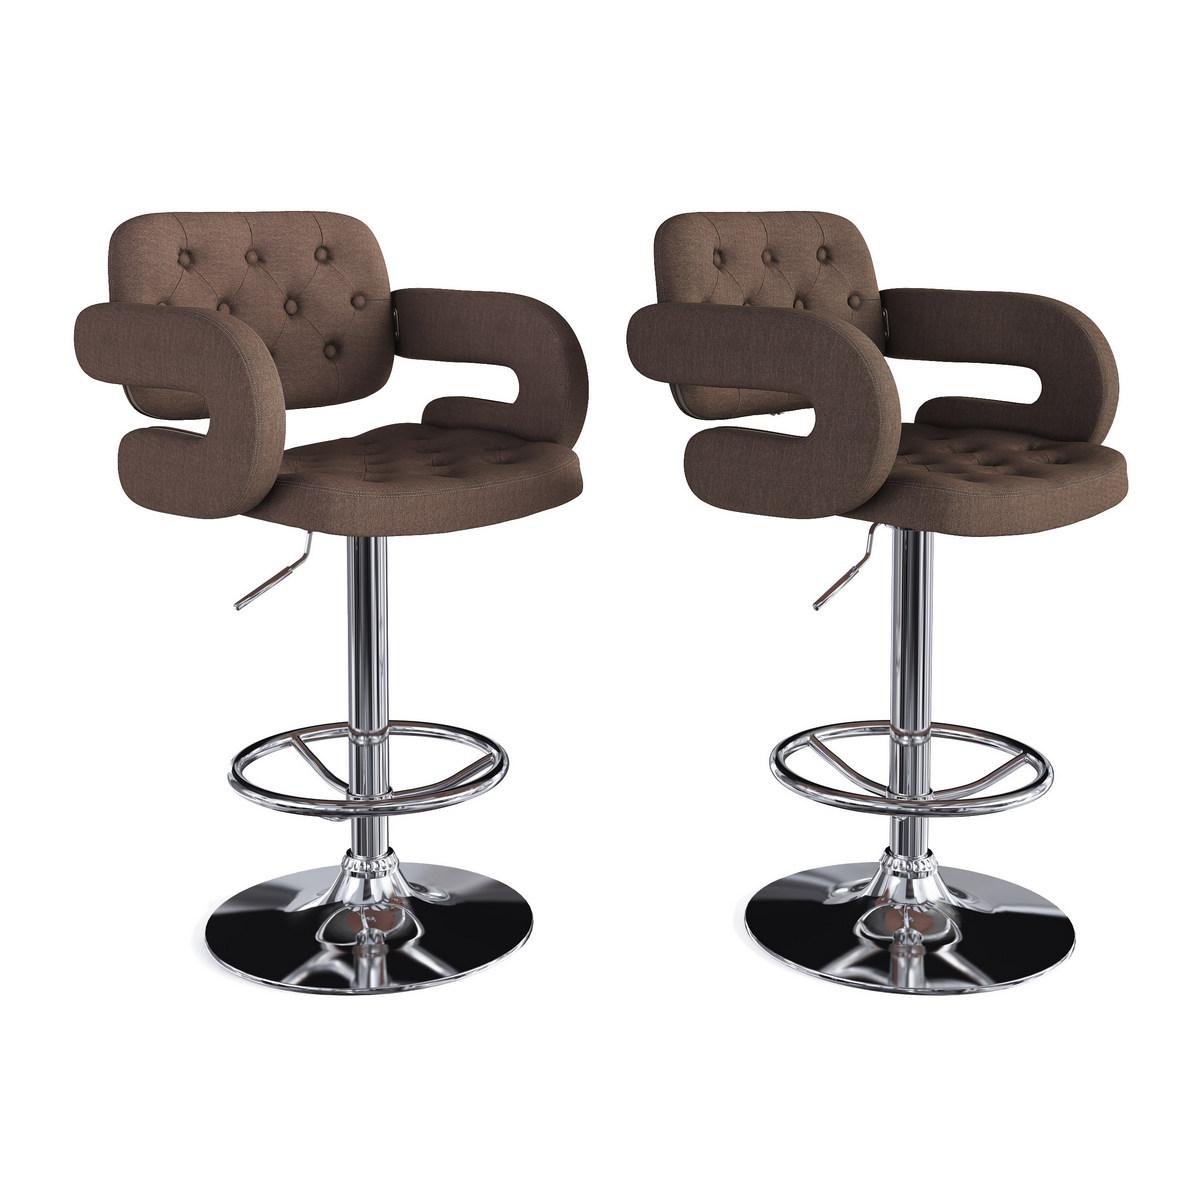 CorLiving DAB-227-B Adjustable Tufted Dark Brown Fabric Barstool w/ Armrests, set of 2